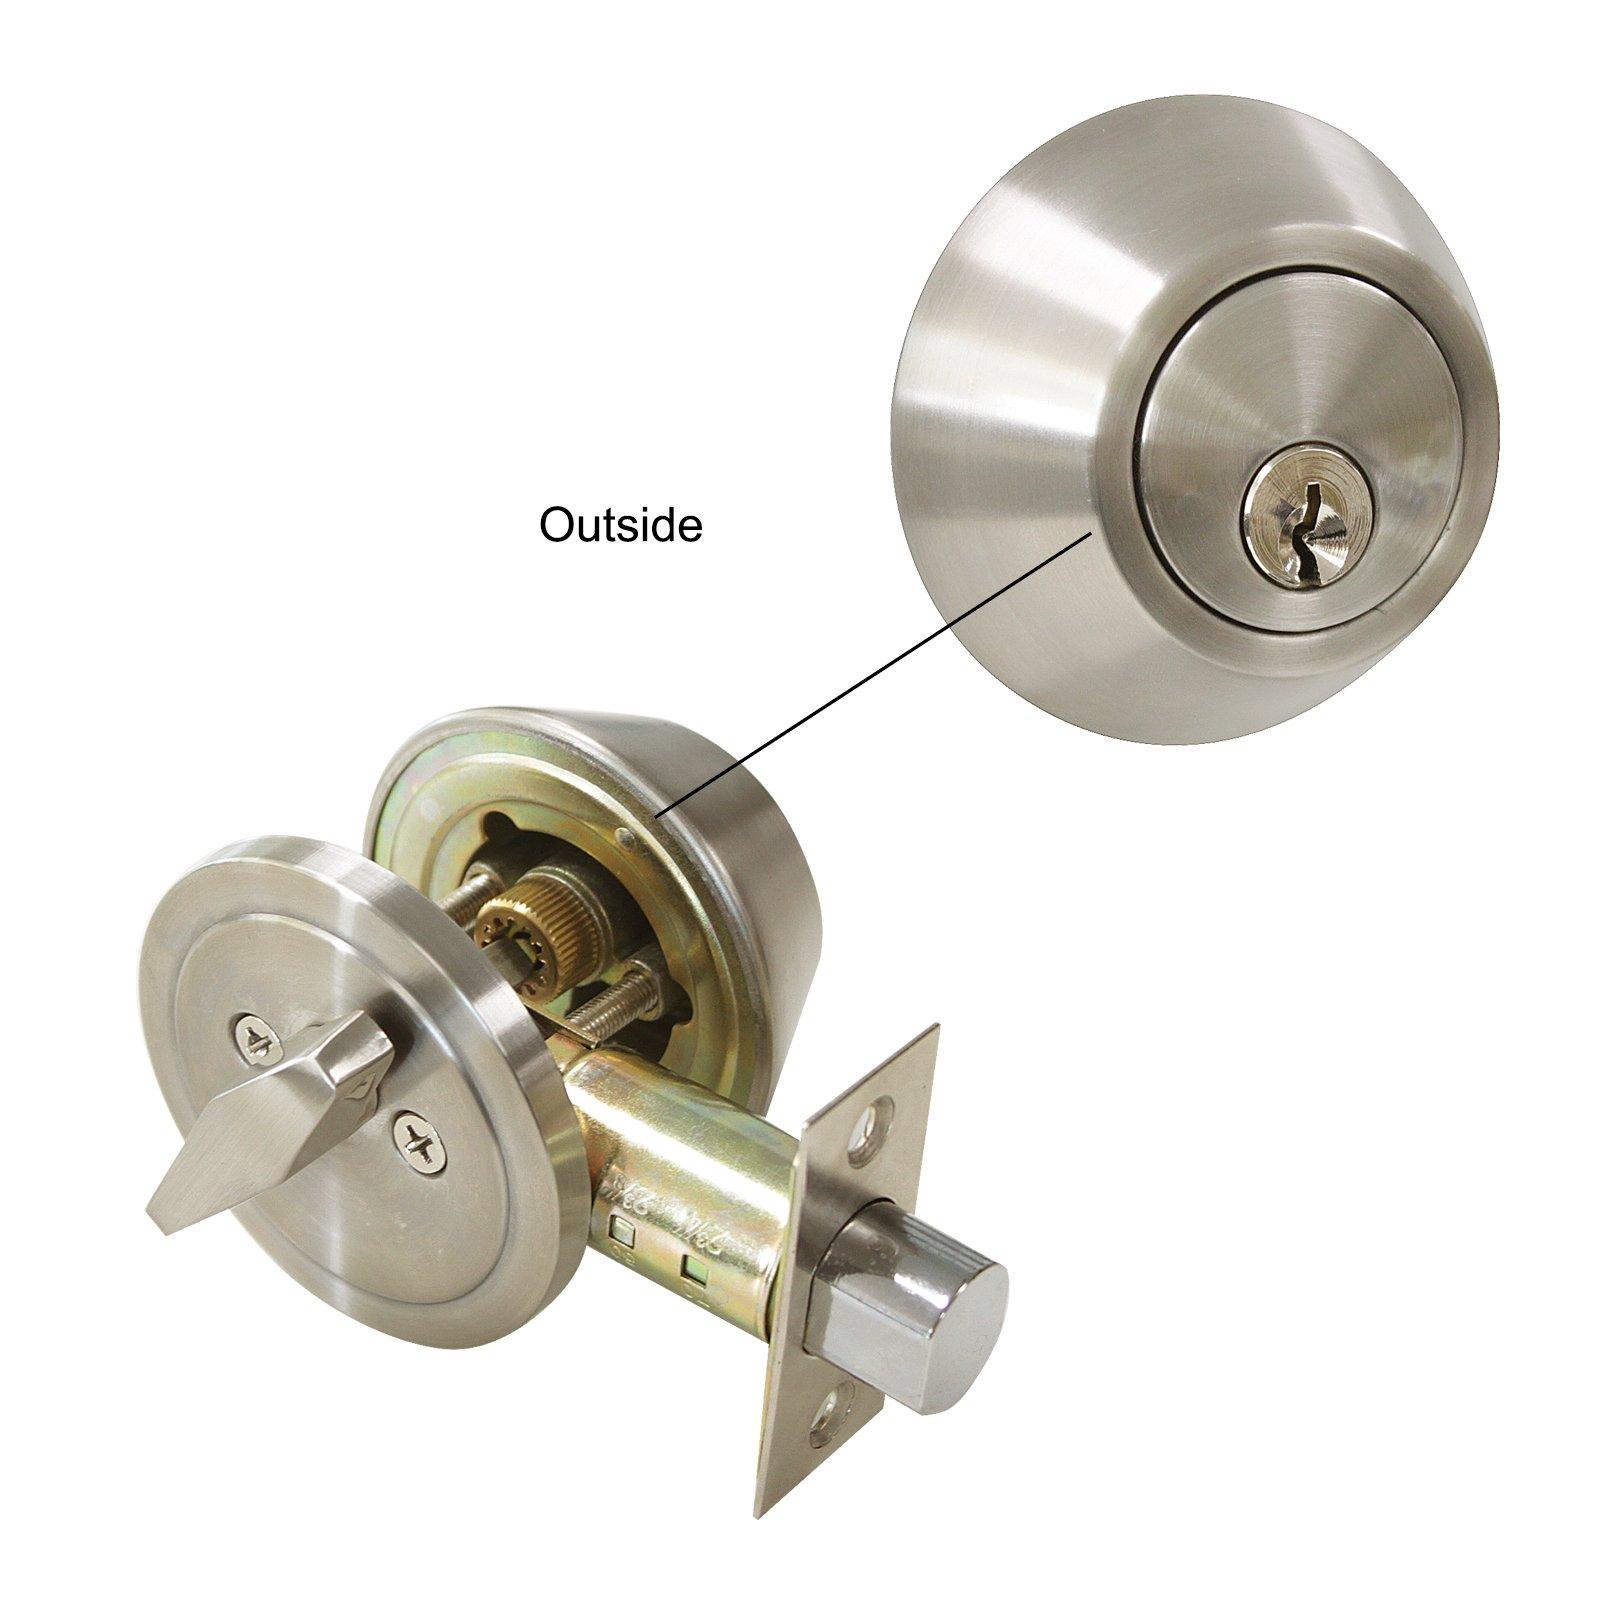 3 Pack Probrico Interior Bedroom Single Cylinder Deadbolt One Keyway Keyed Alike Same Key Safety Bolt Door Lock Lockset in Satin Nickel-Single Deadbolt-101 by Probrico (Image #4)